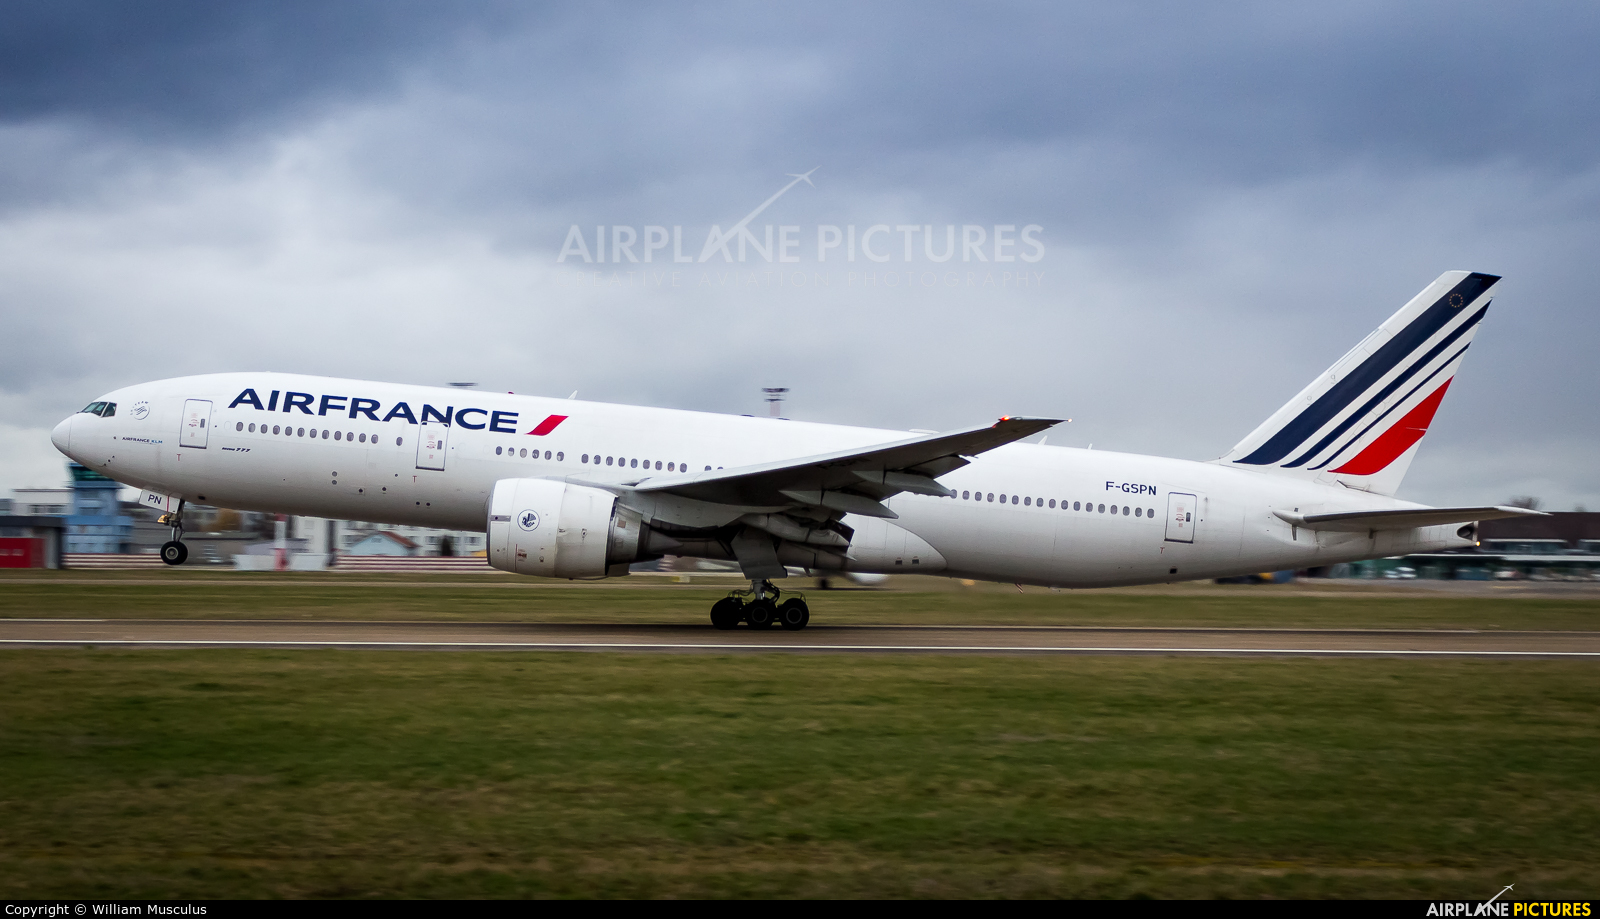 Air France F-GSPN aircraft at Strasbourg-Entzheim